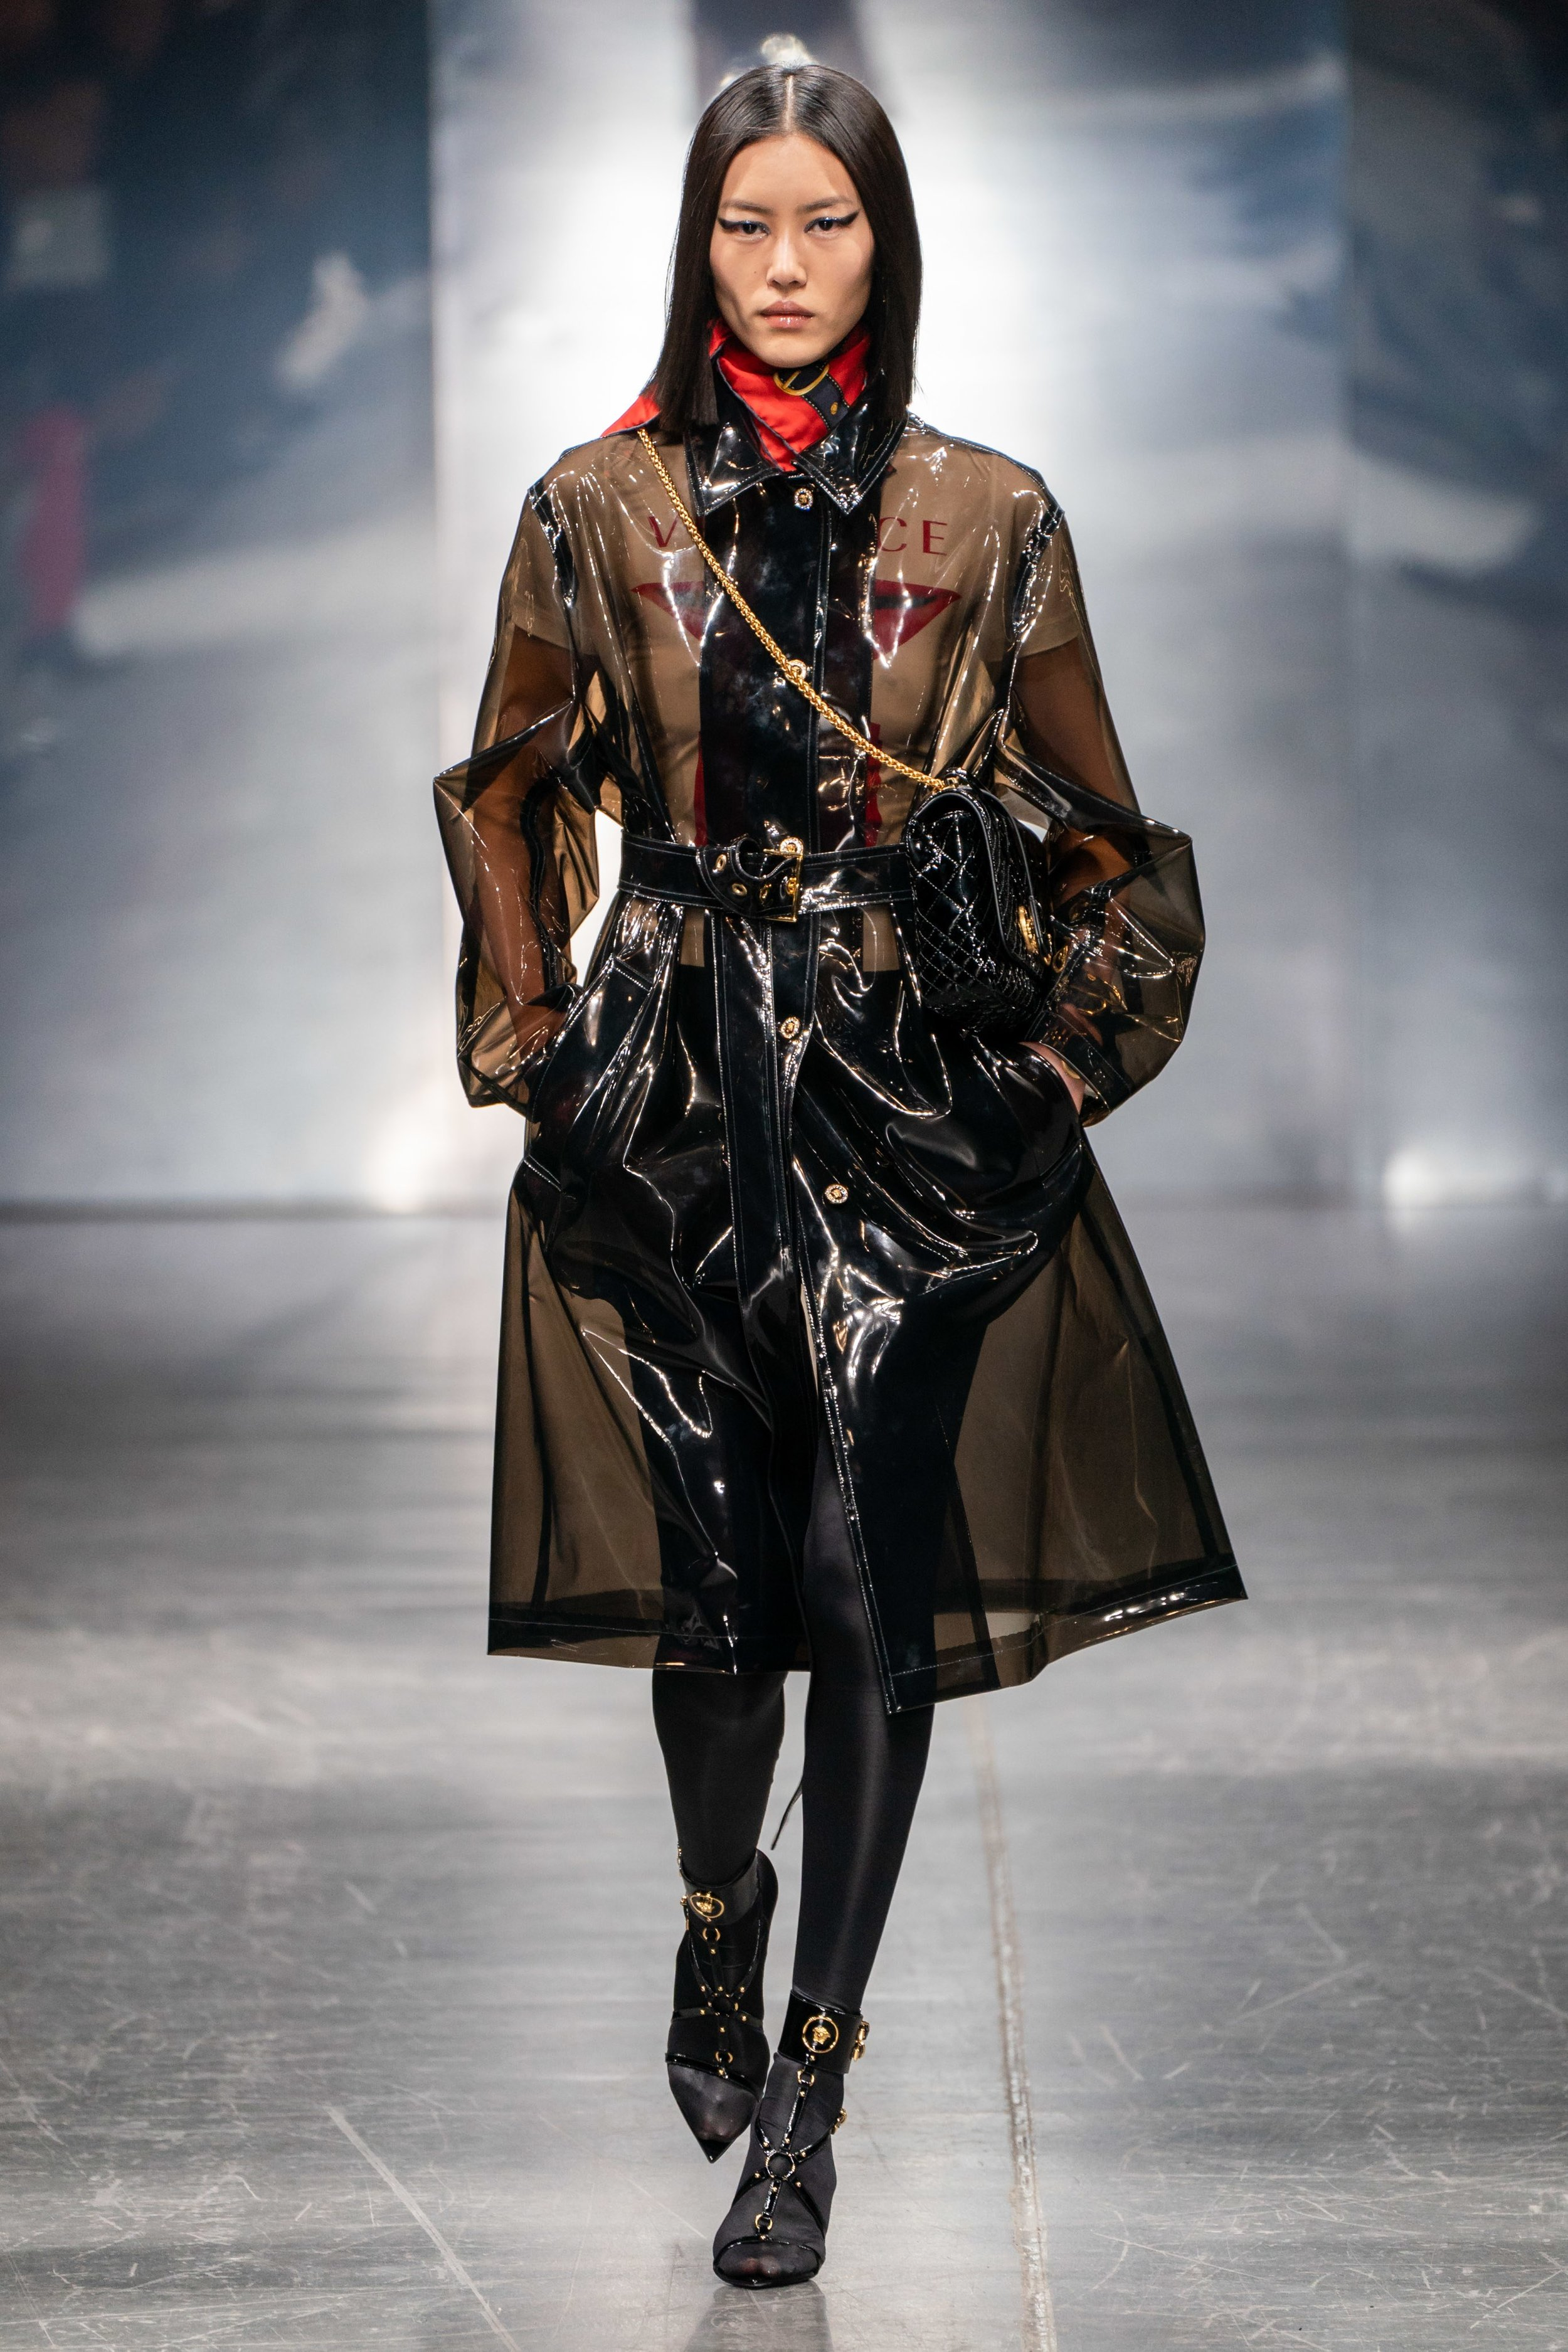 Versace Photo: Alessandro Lucioni / Gorunway.com for Vogue